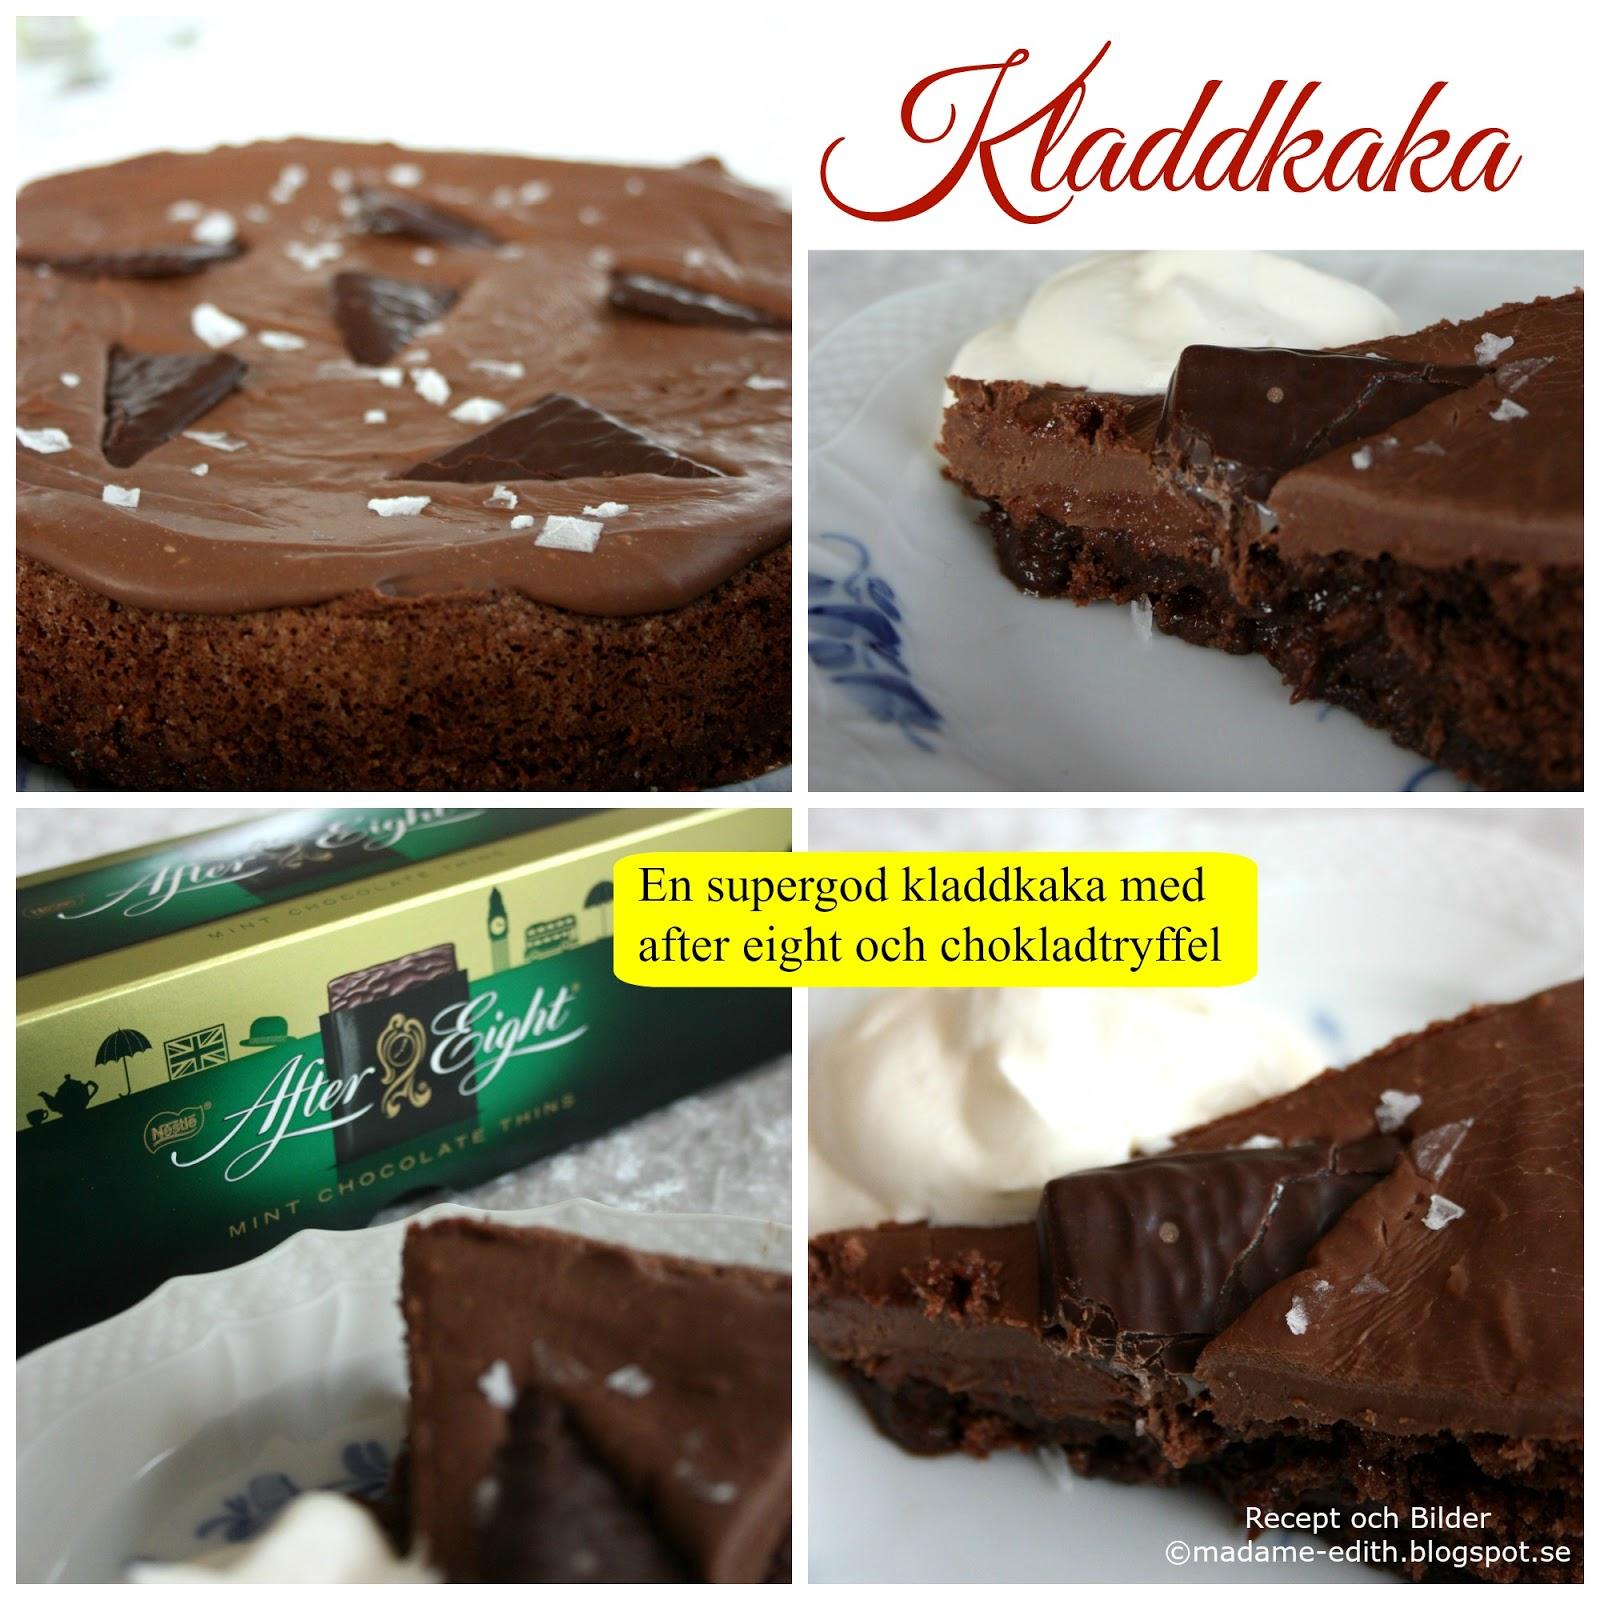 After Eight Kladdkaka